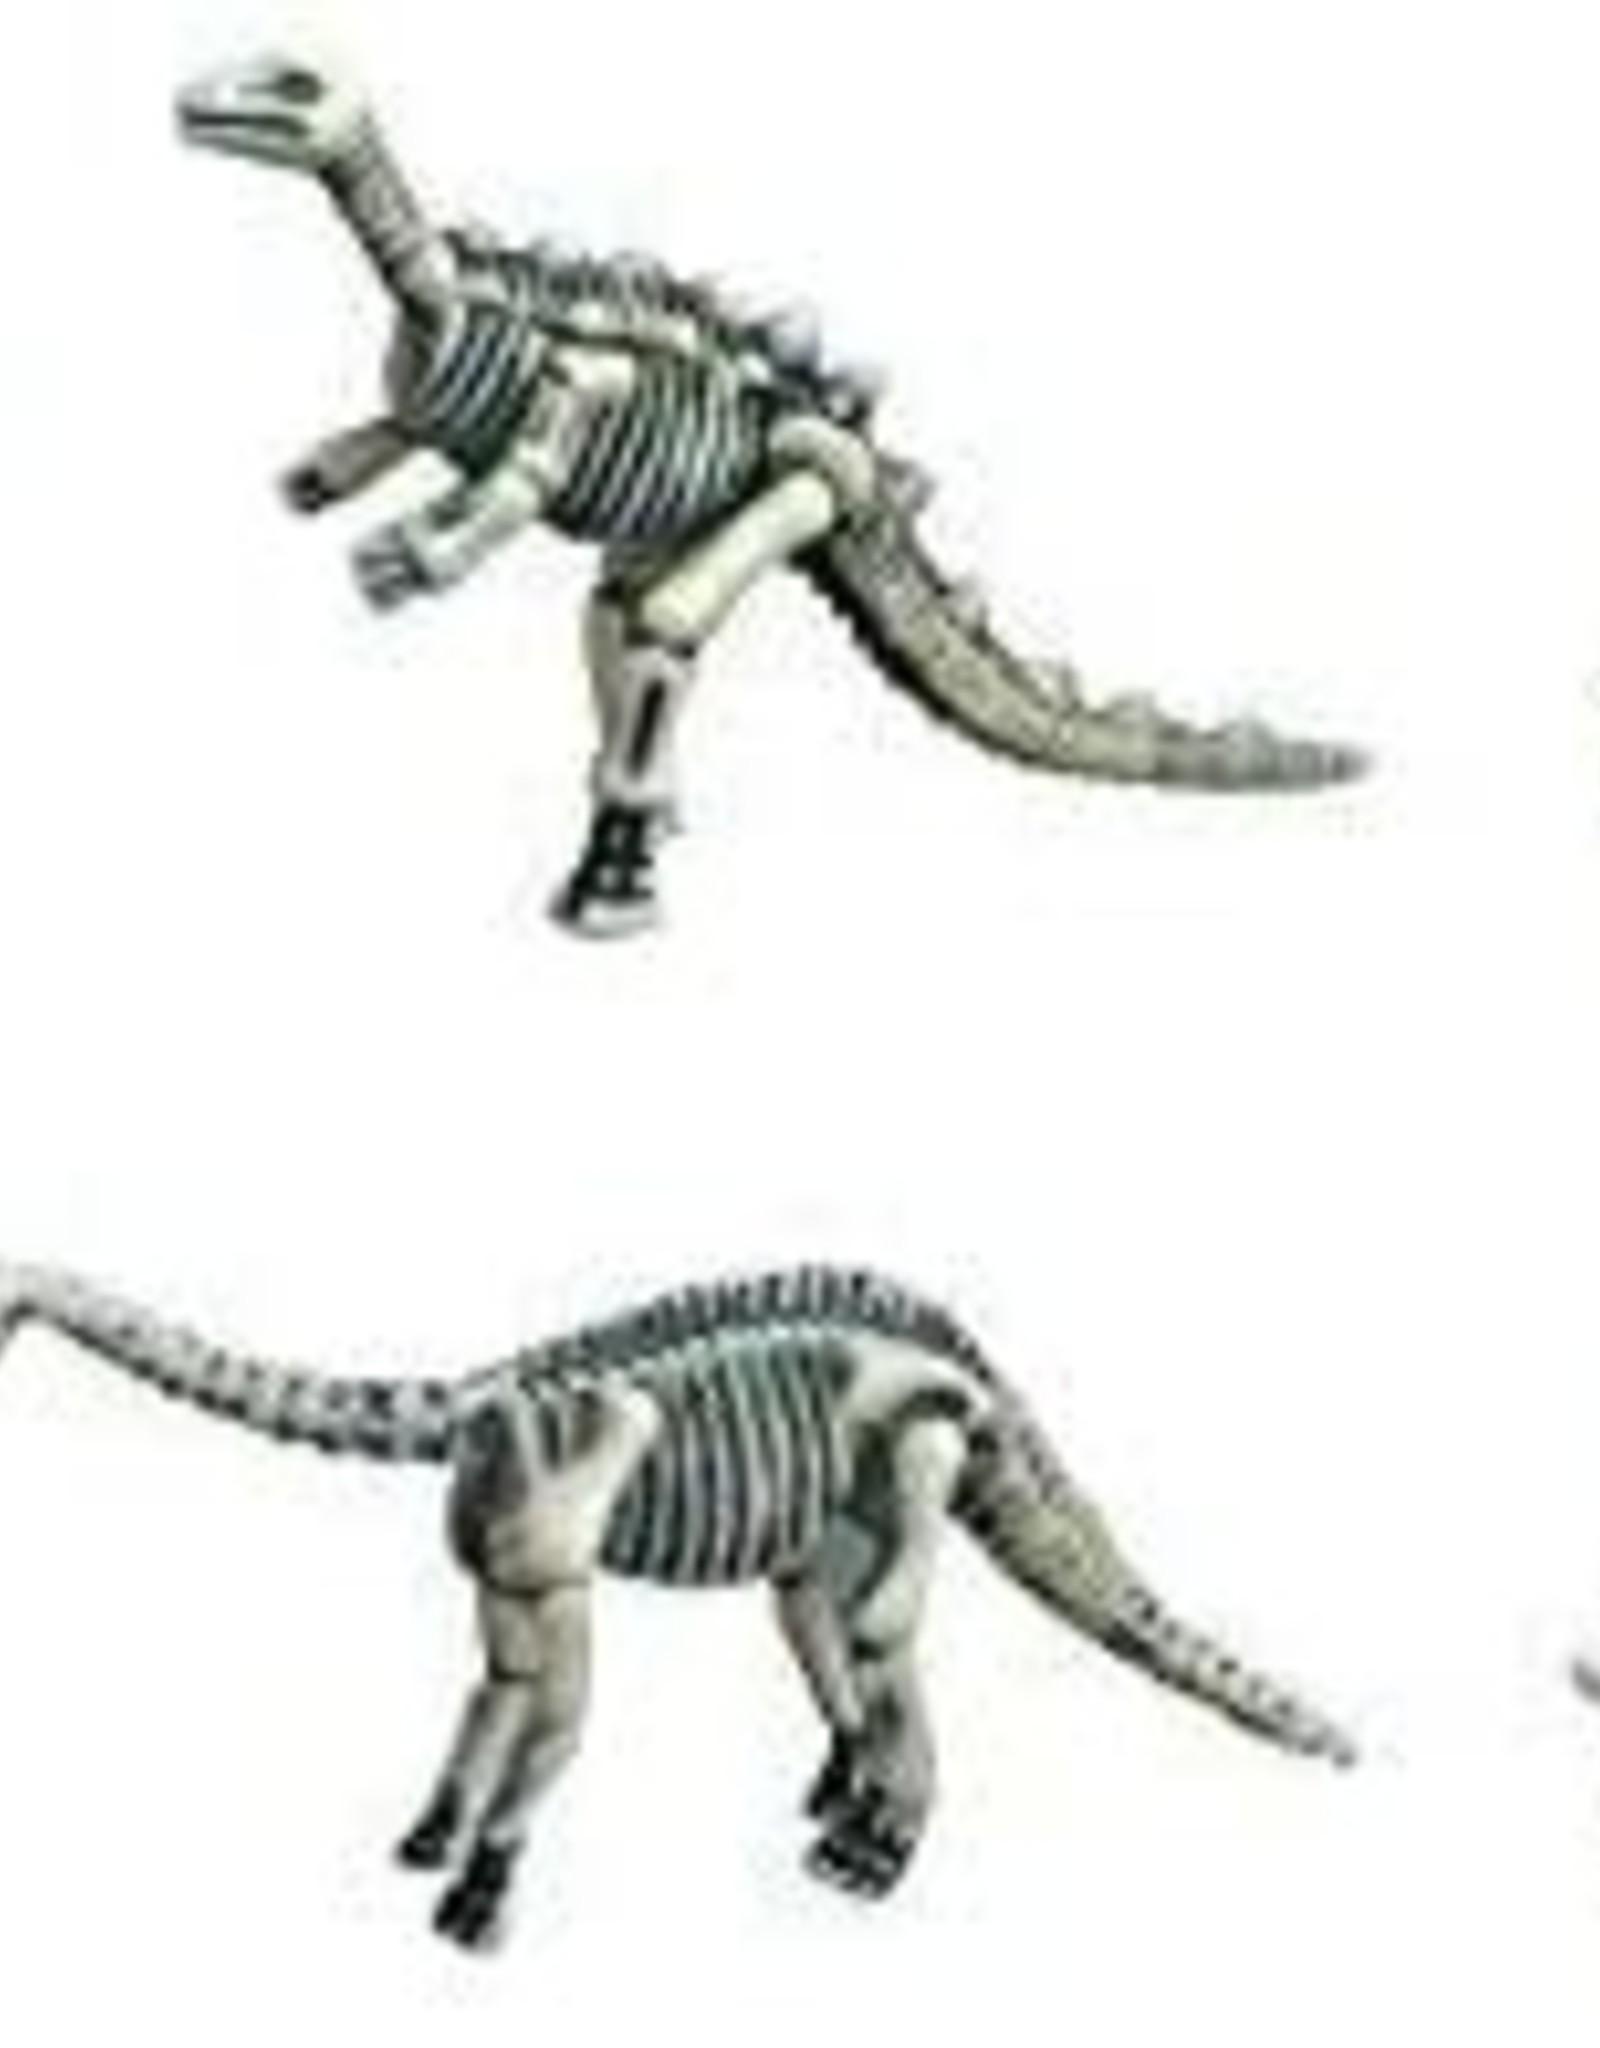 WowToyz Dinosaur Fossil Dig Eggs